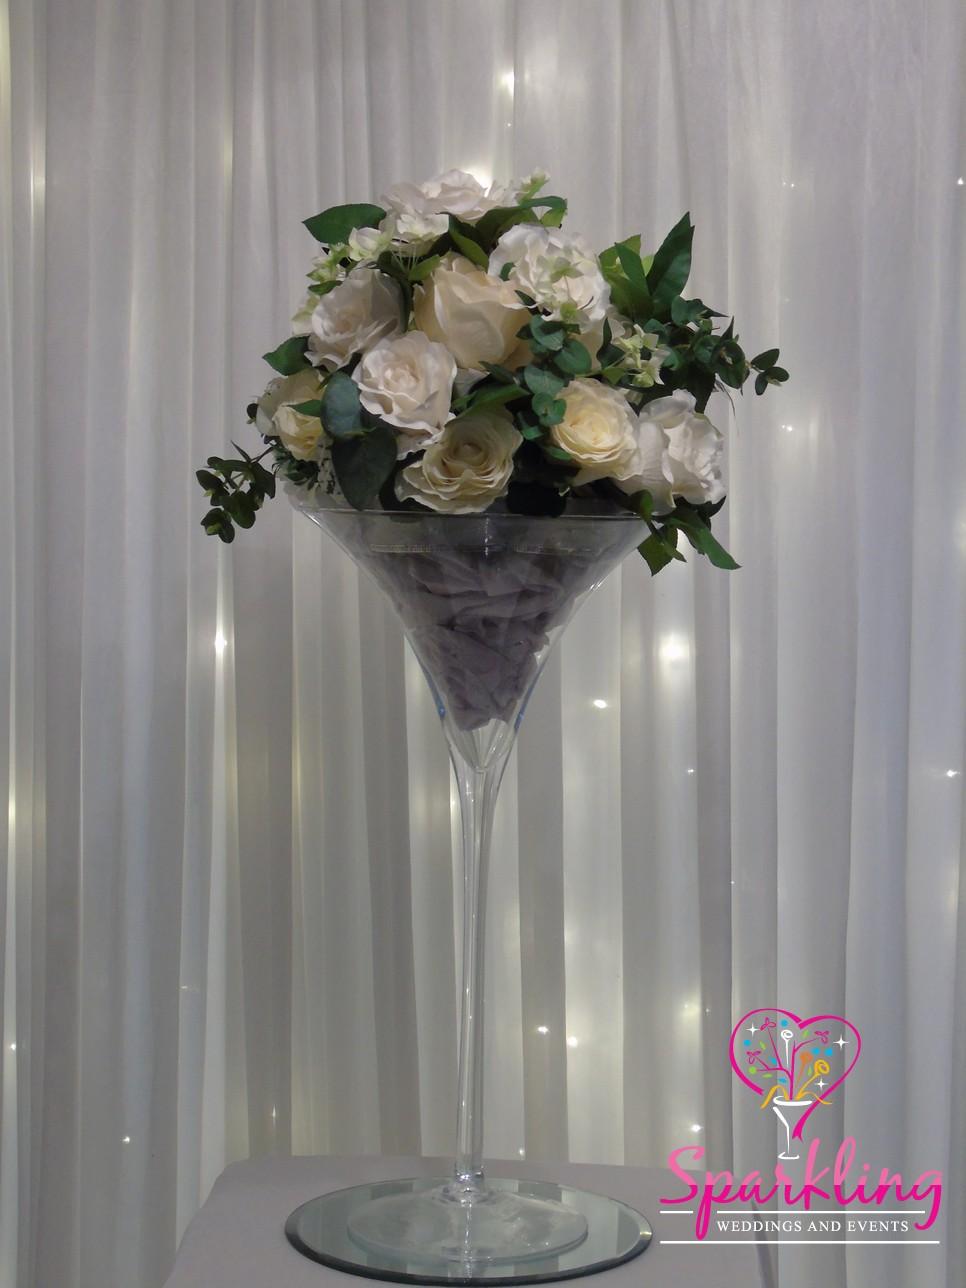 3 Martini Vase With White Floral Arrangement